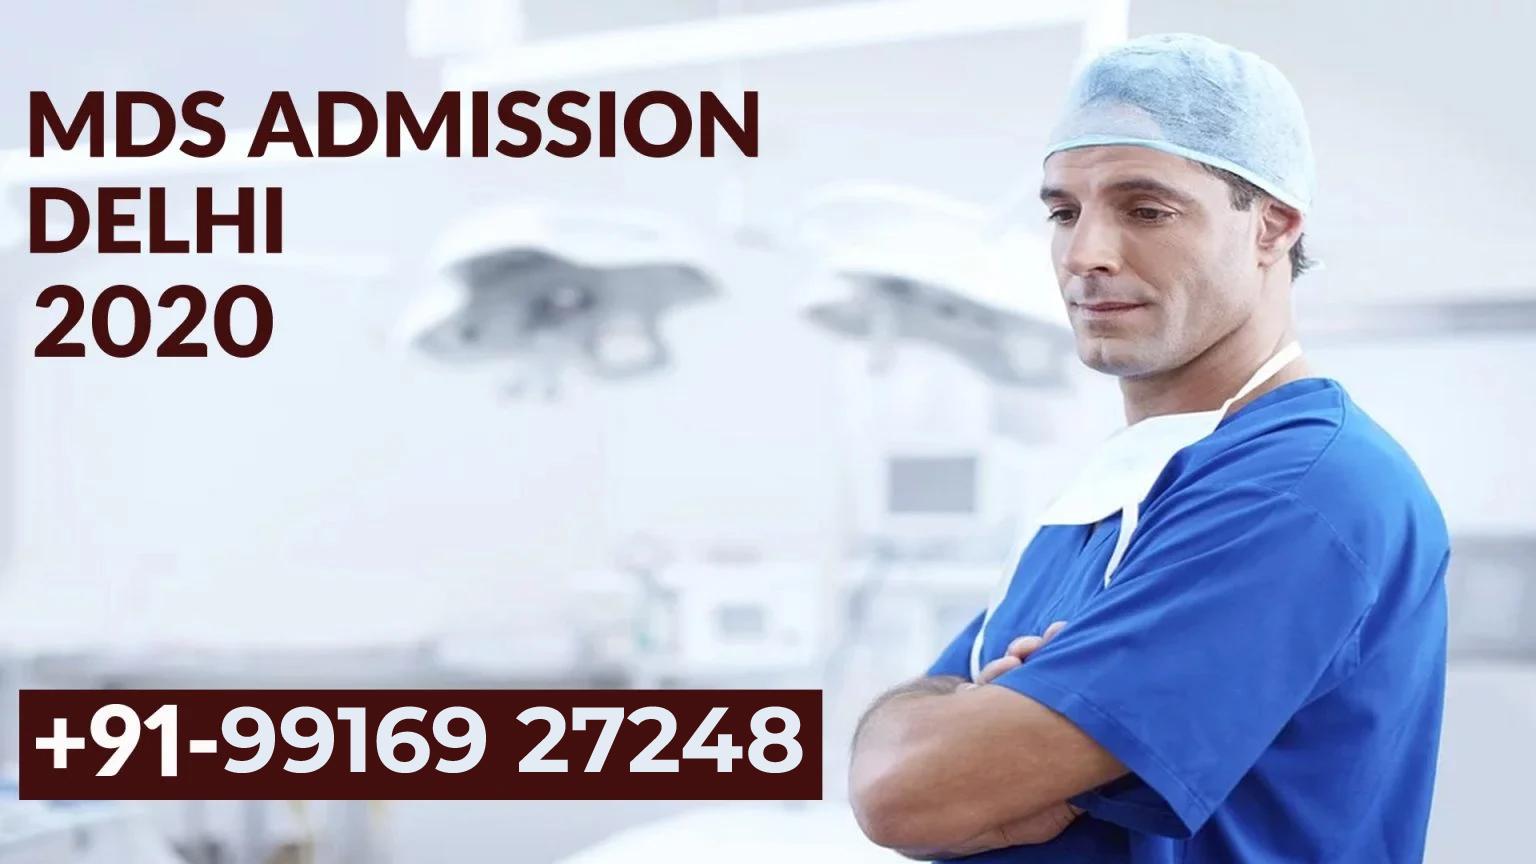 MDS admission in Delhi